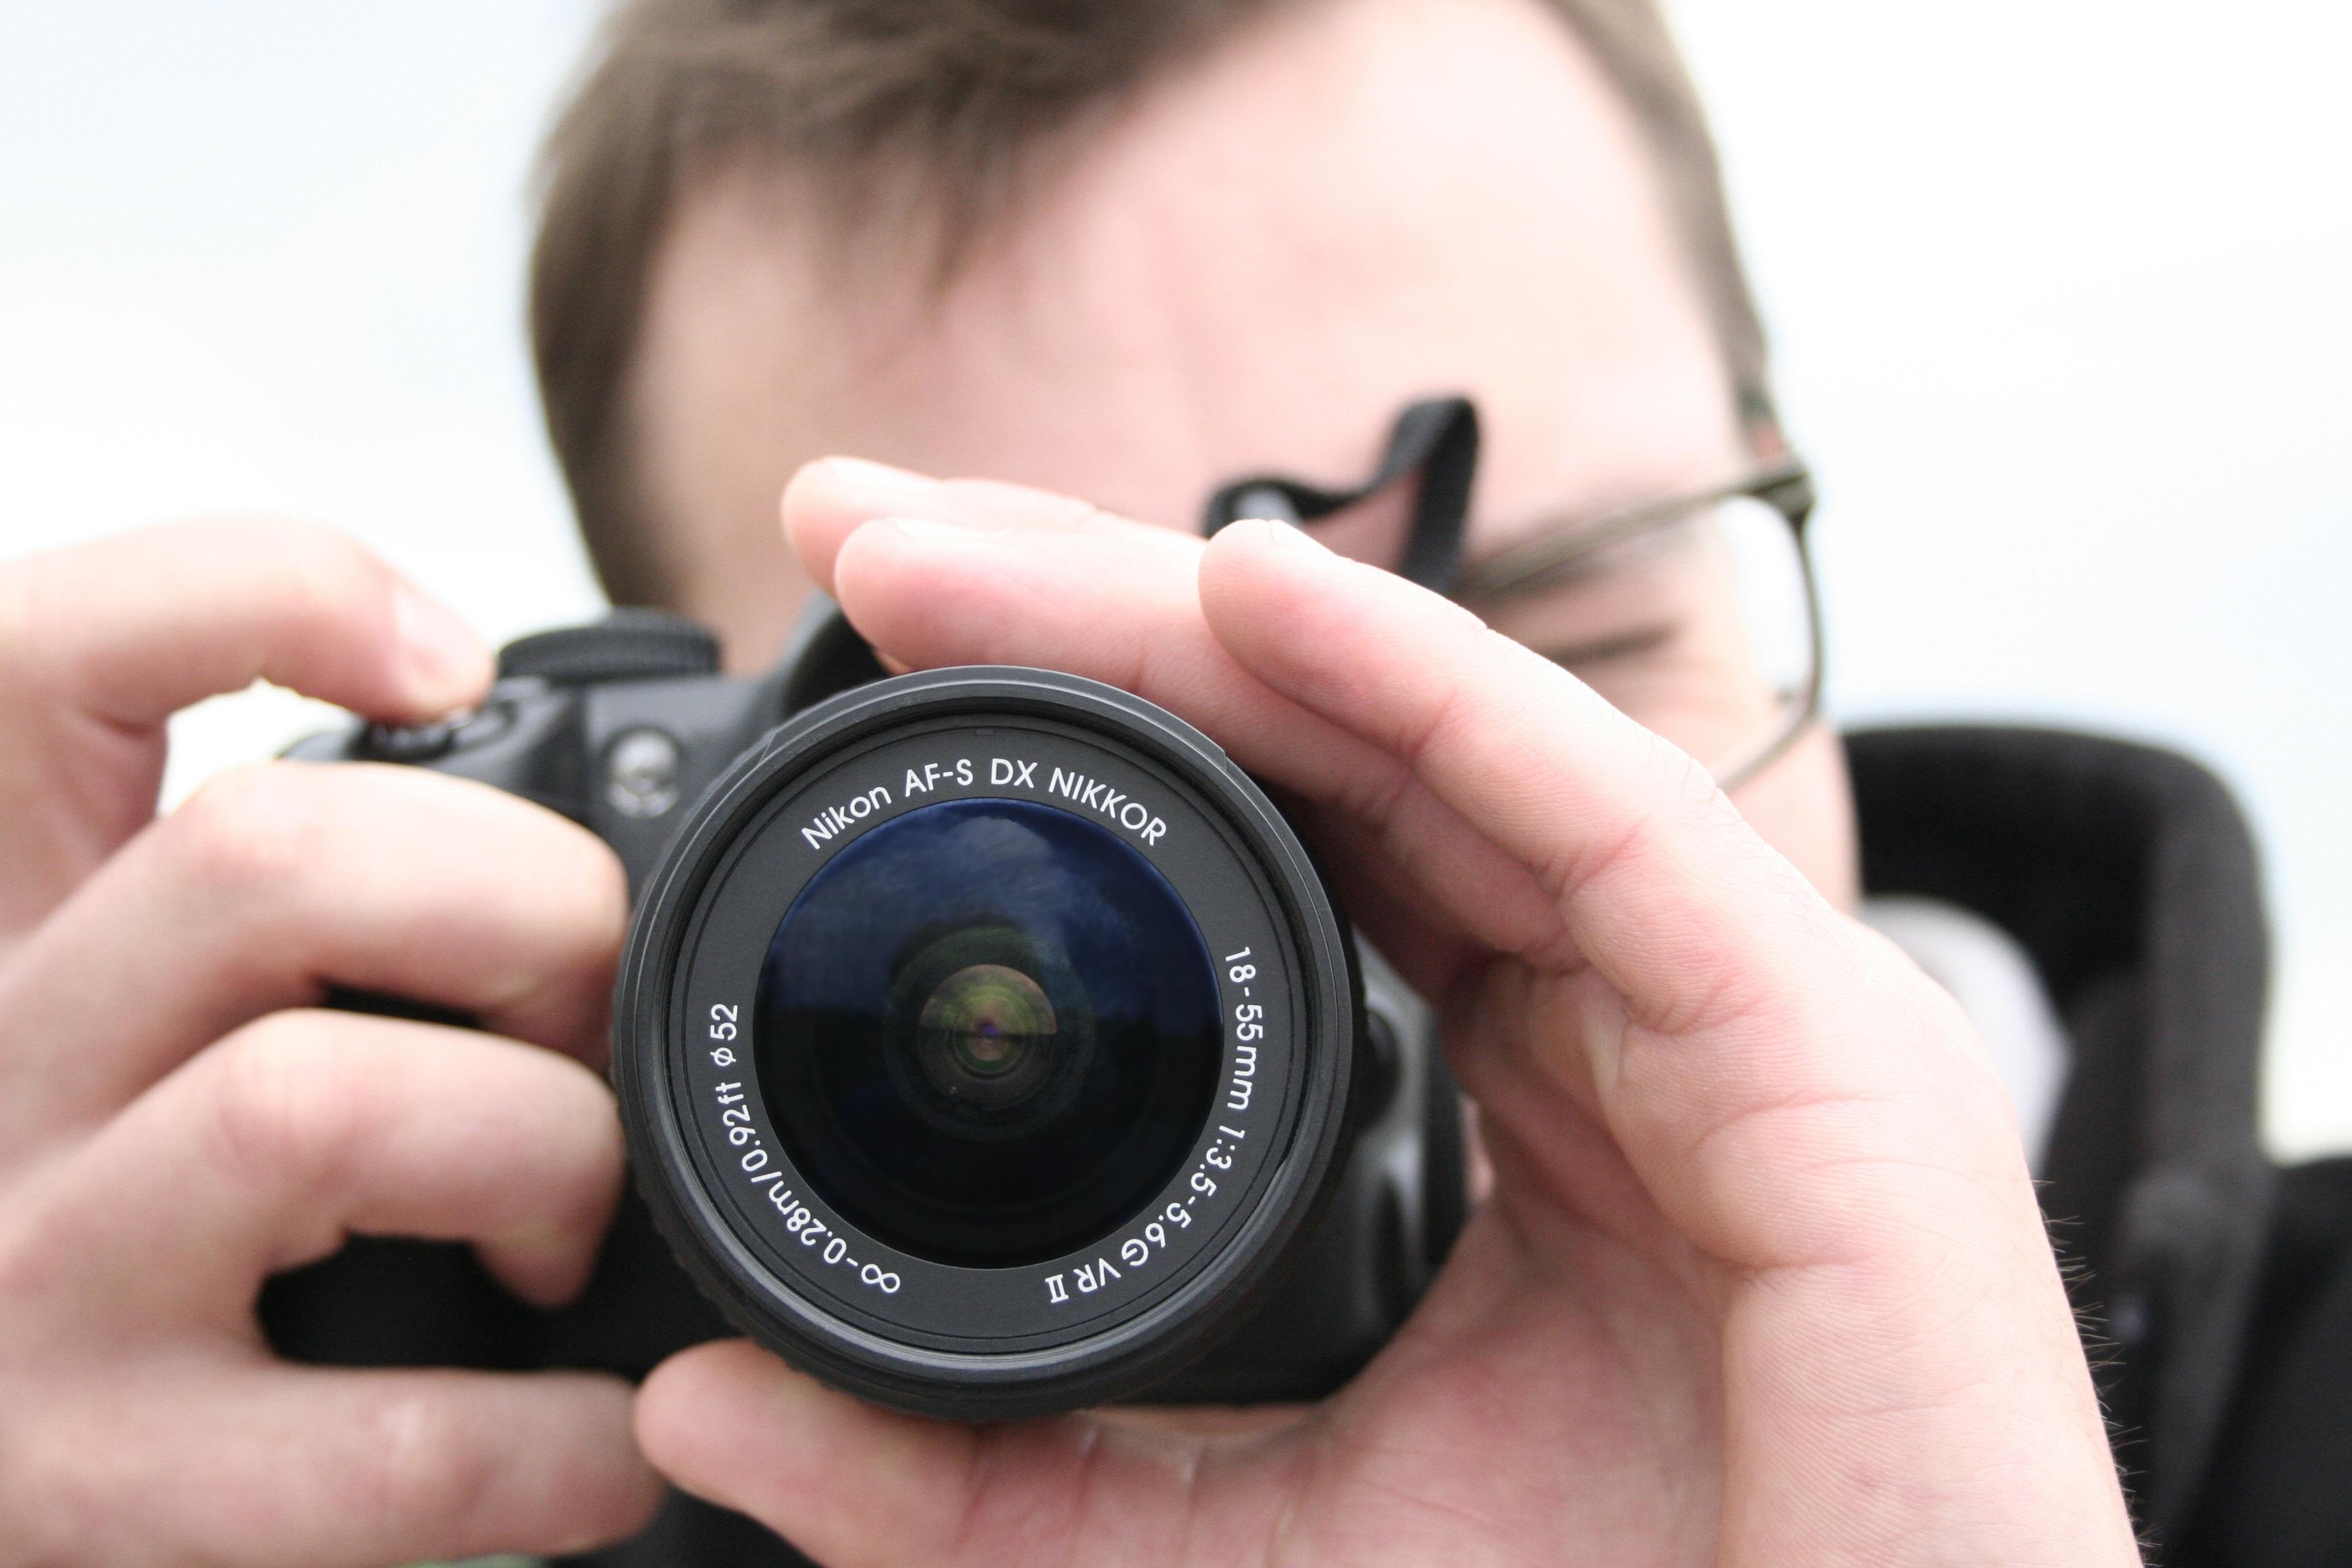 Free Images : photographer, dslr, nikon, taking photo